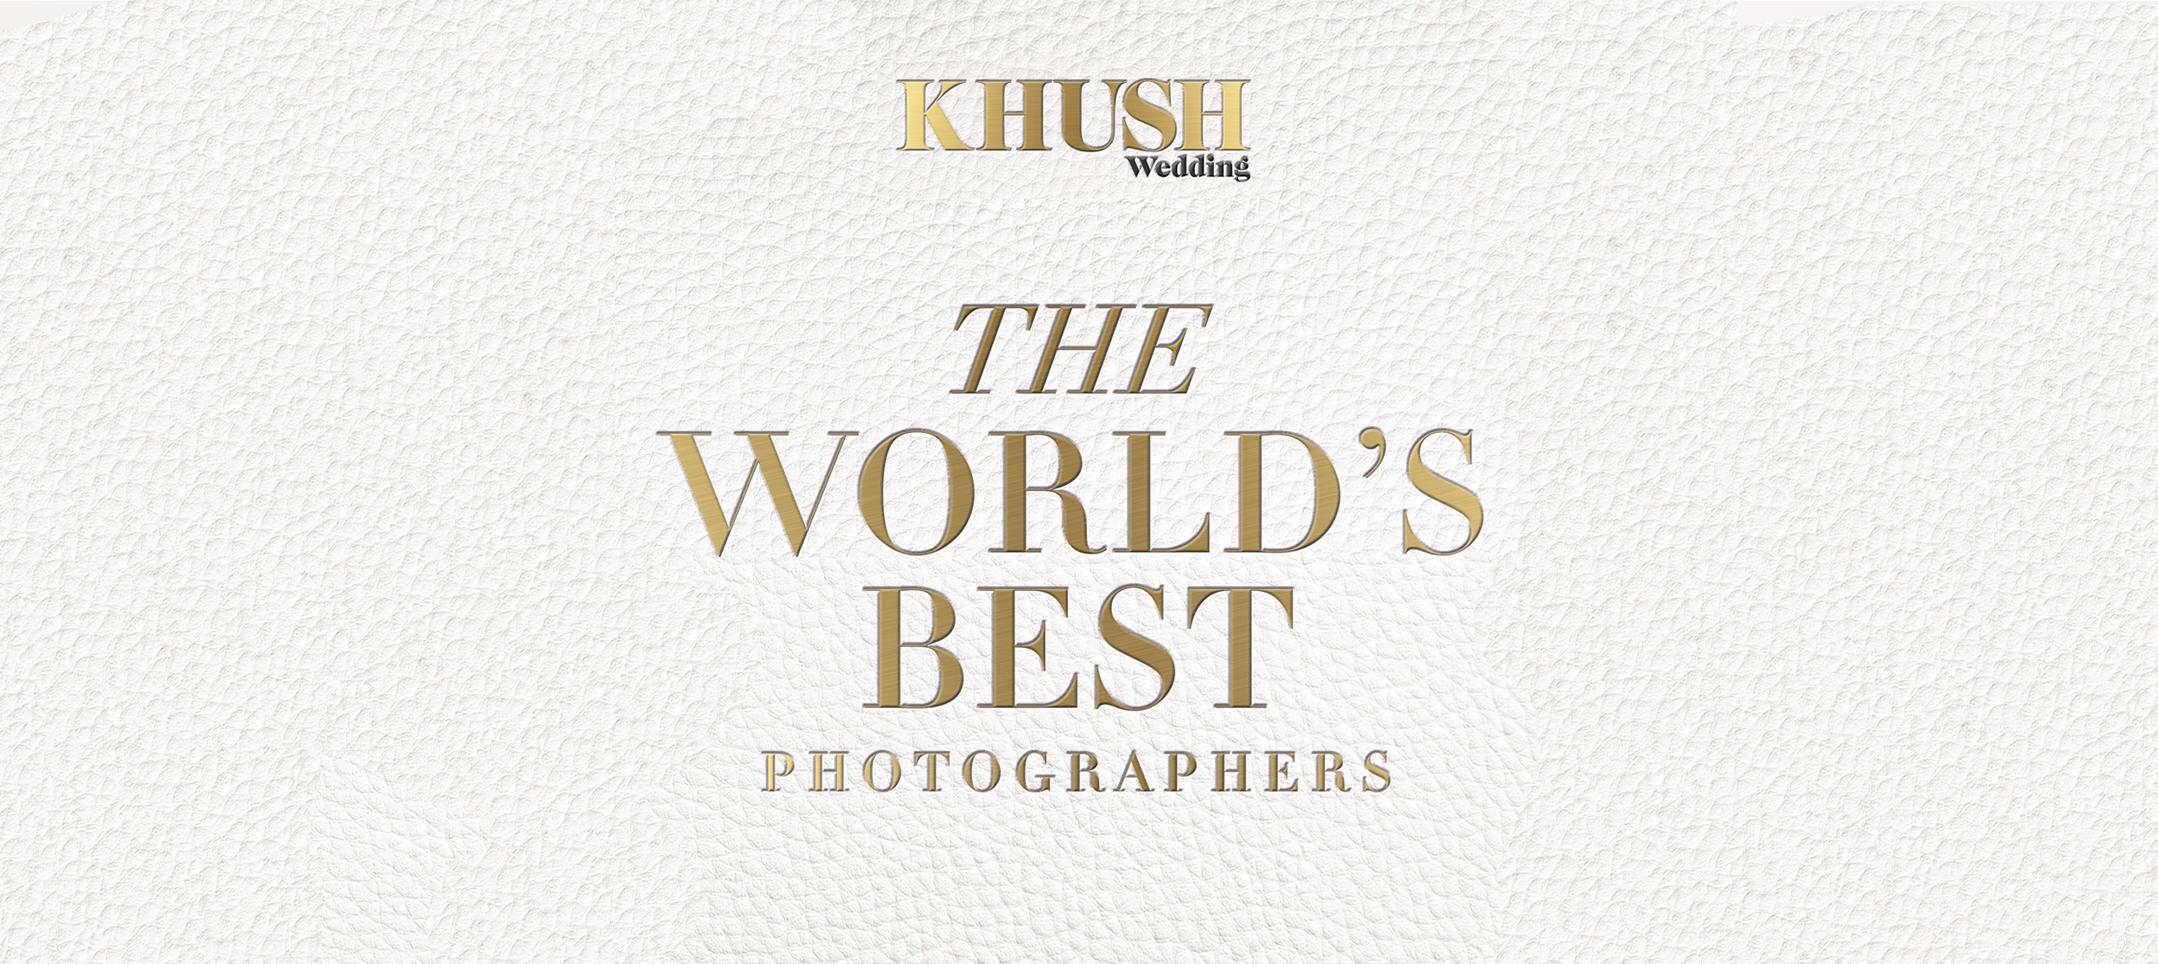 Worlds best wedding photographers_zohaib ali.jpg